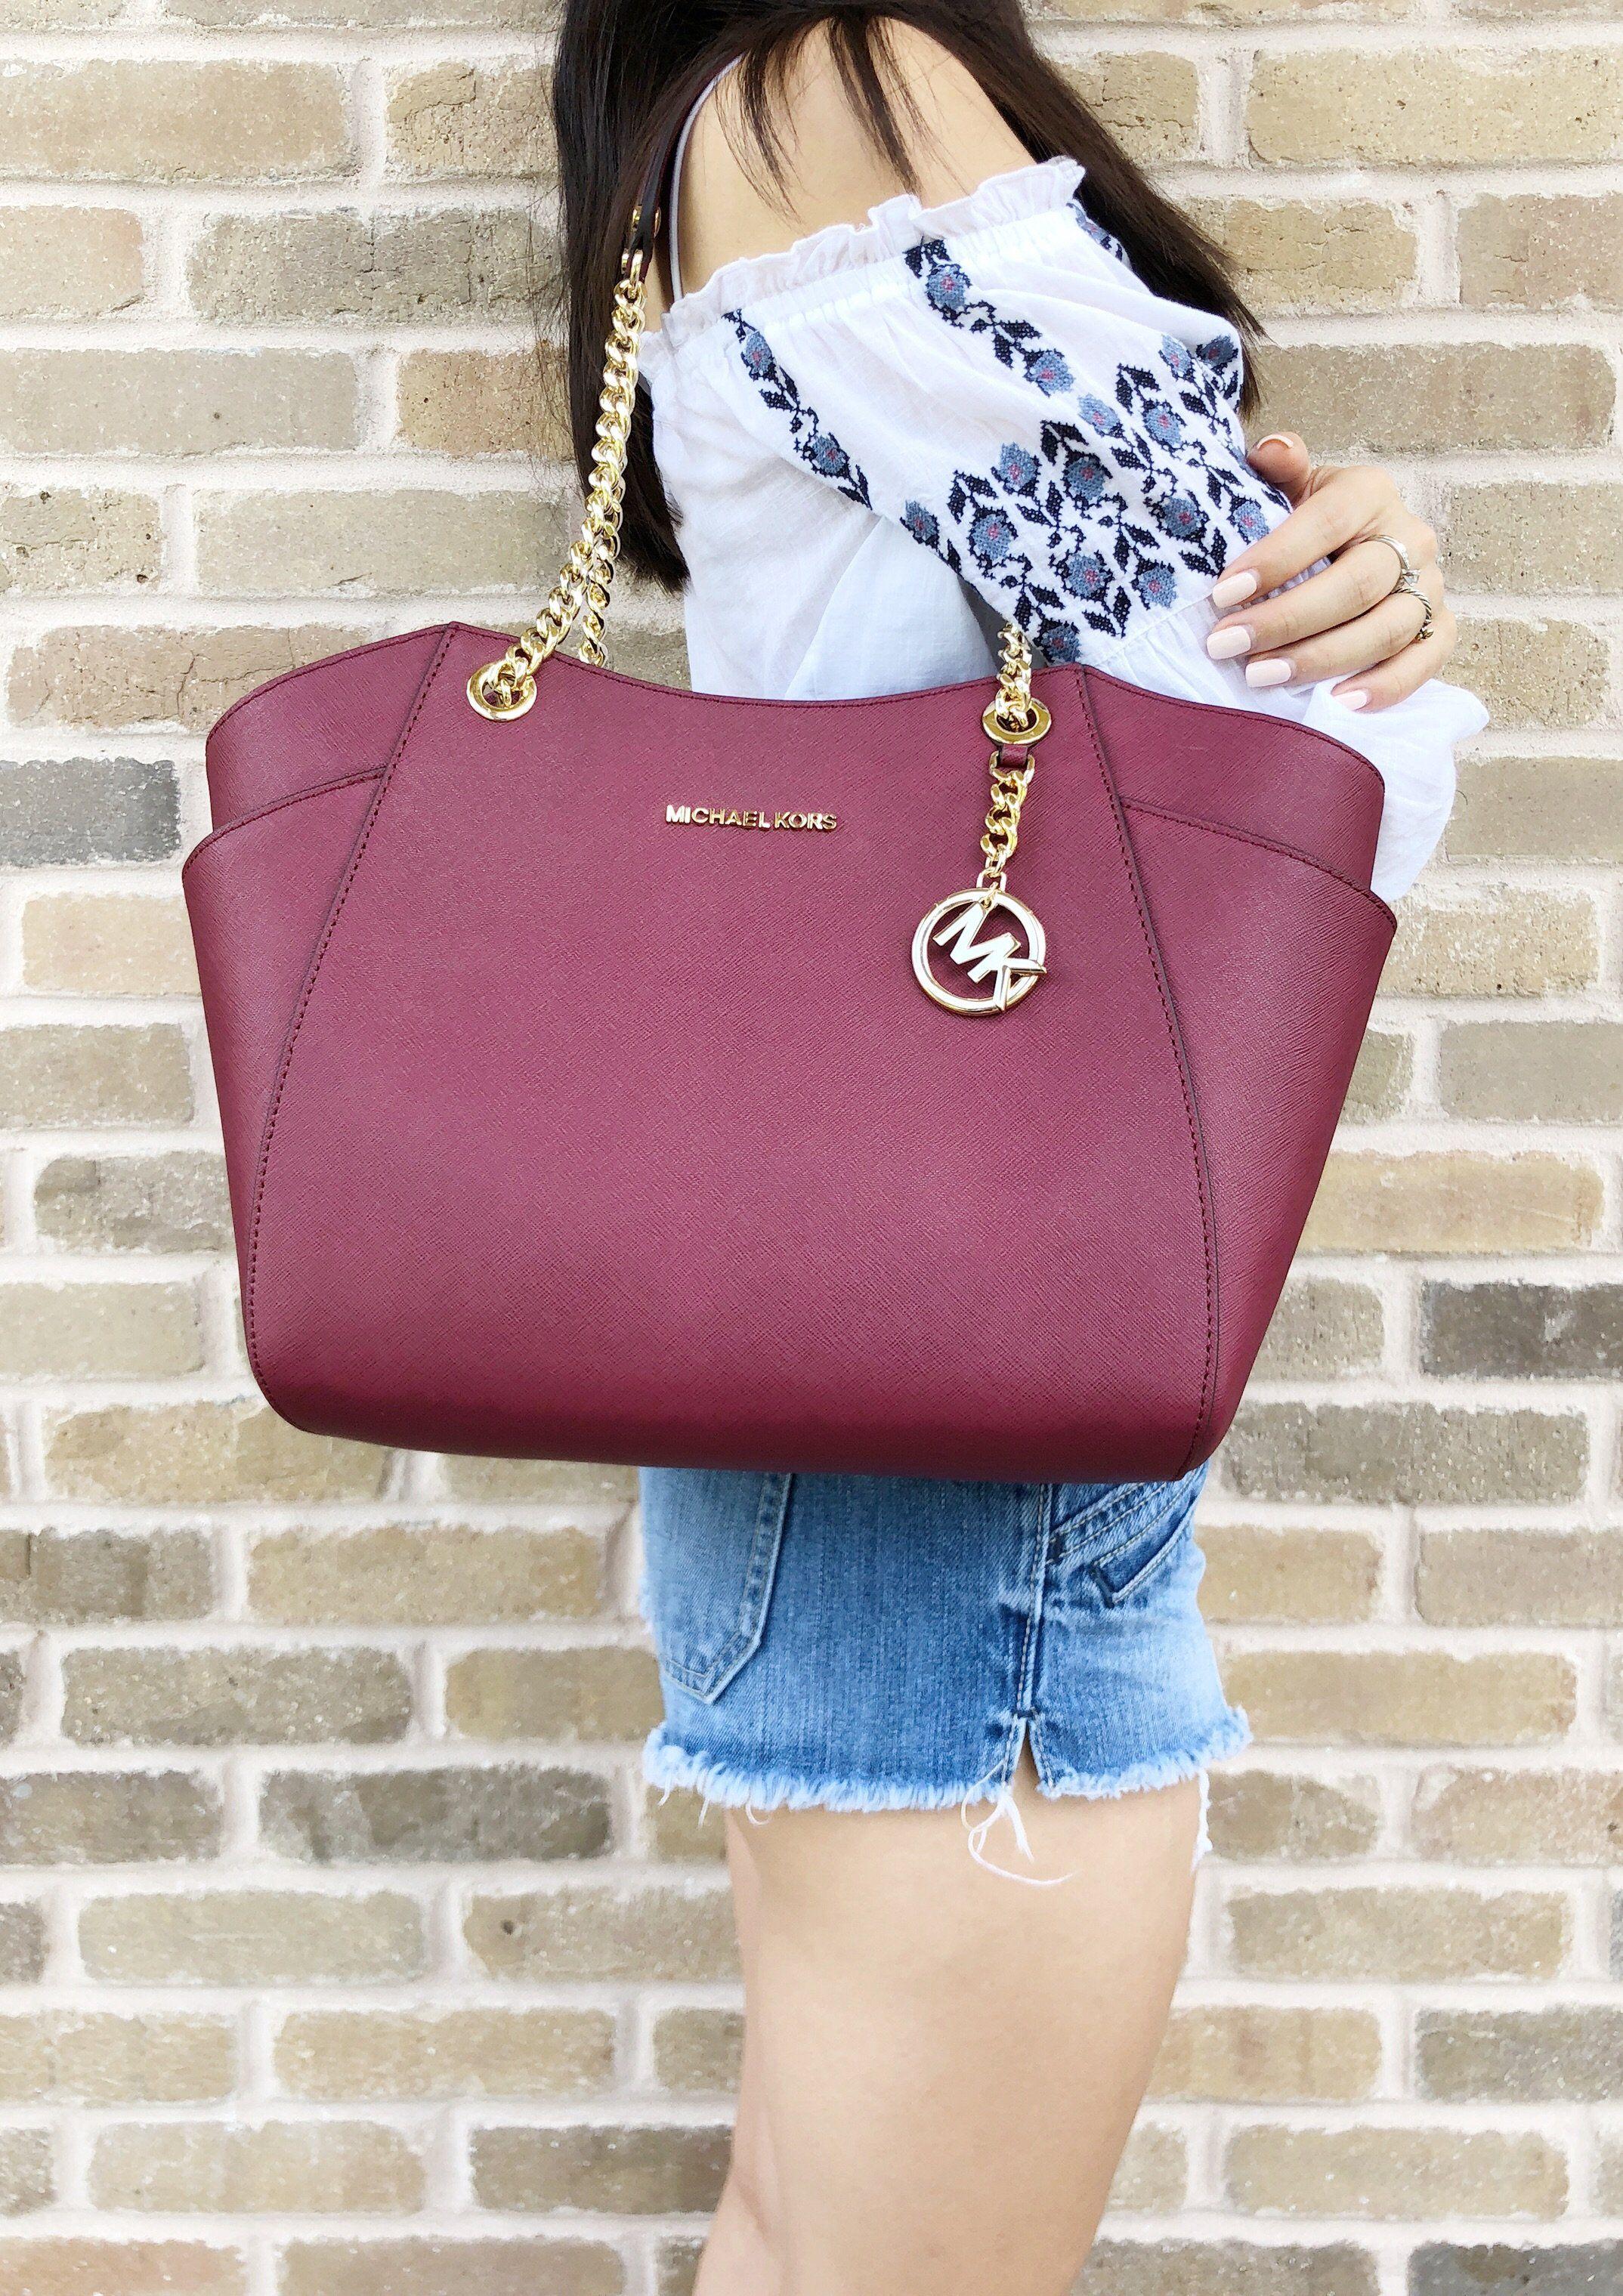 6622677db827 Michael Kors Jet Set Travel Chain Shoulder Tote Bag Mulberry  MK  Handbags   MichaelKors